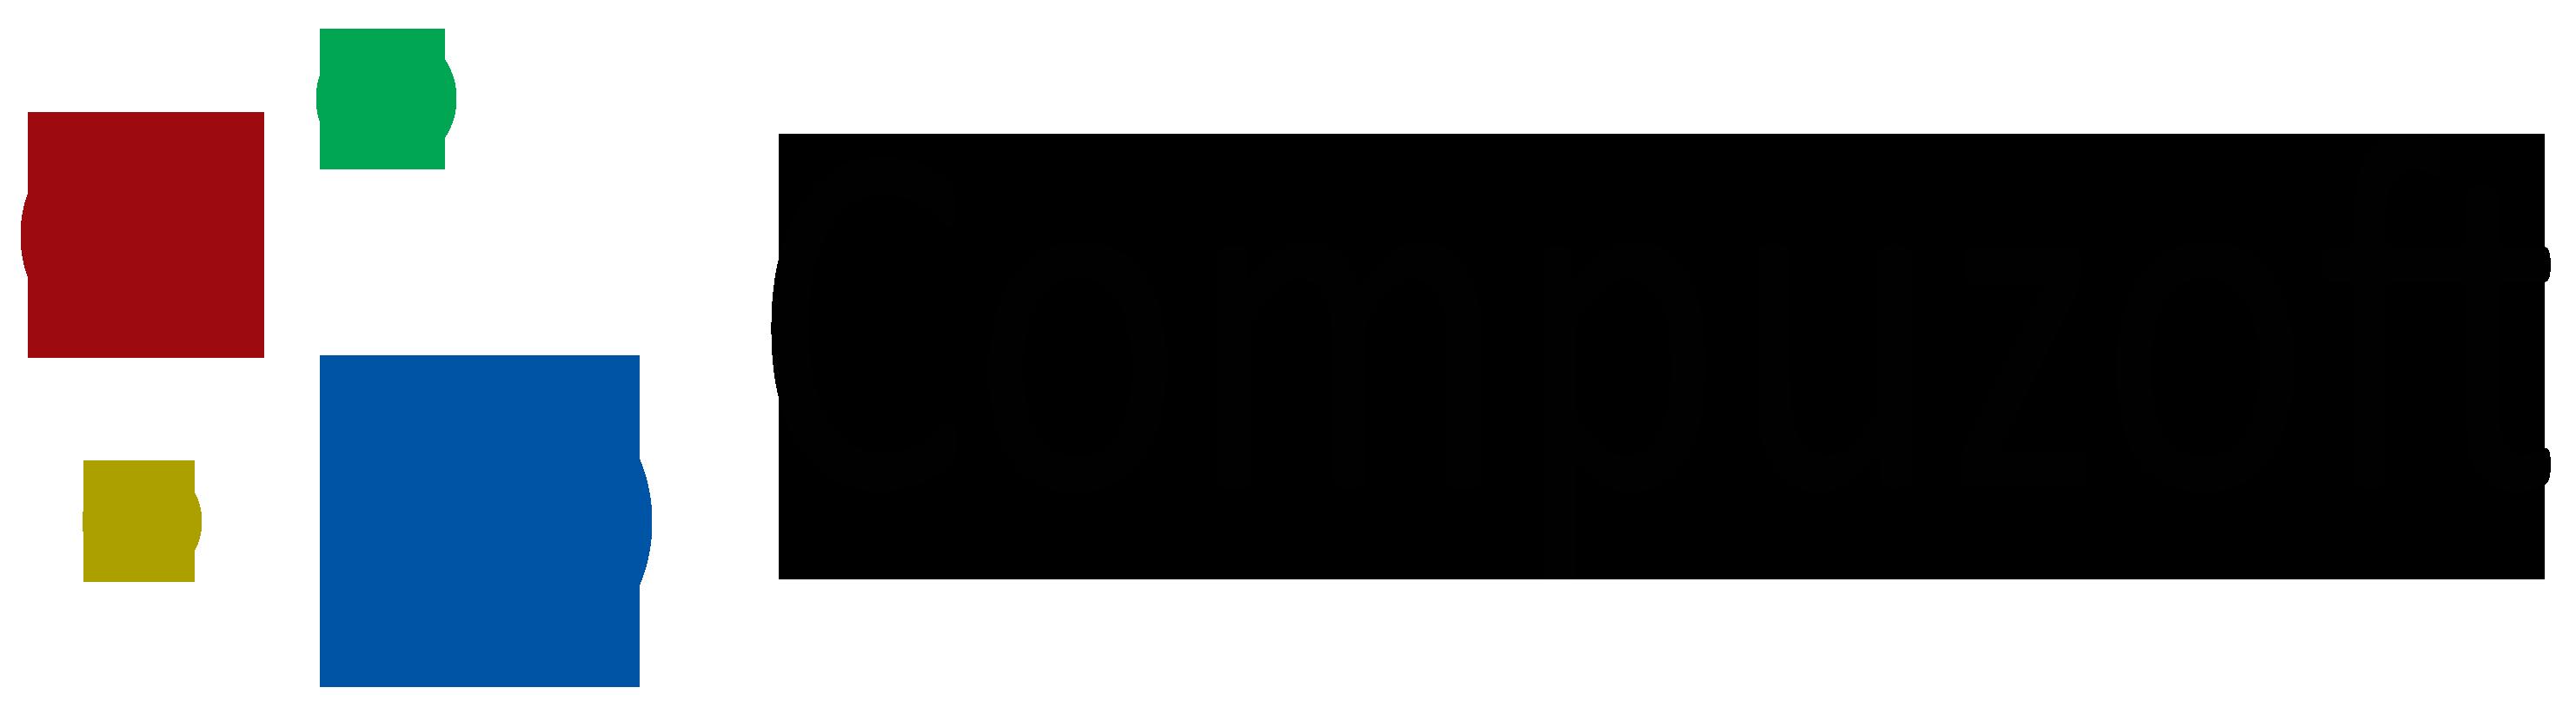 Compuzoft